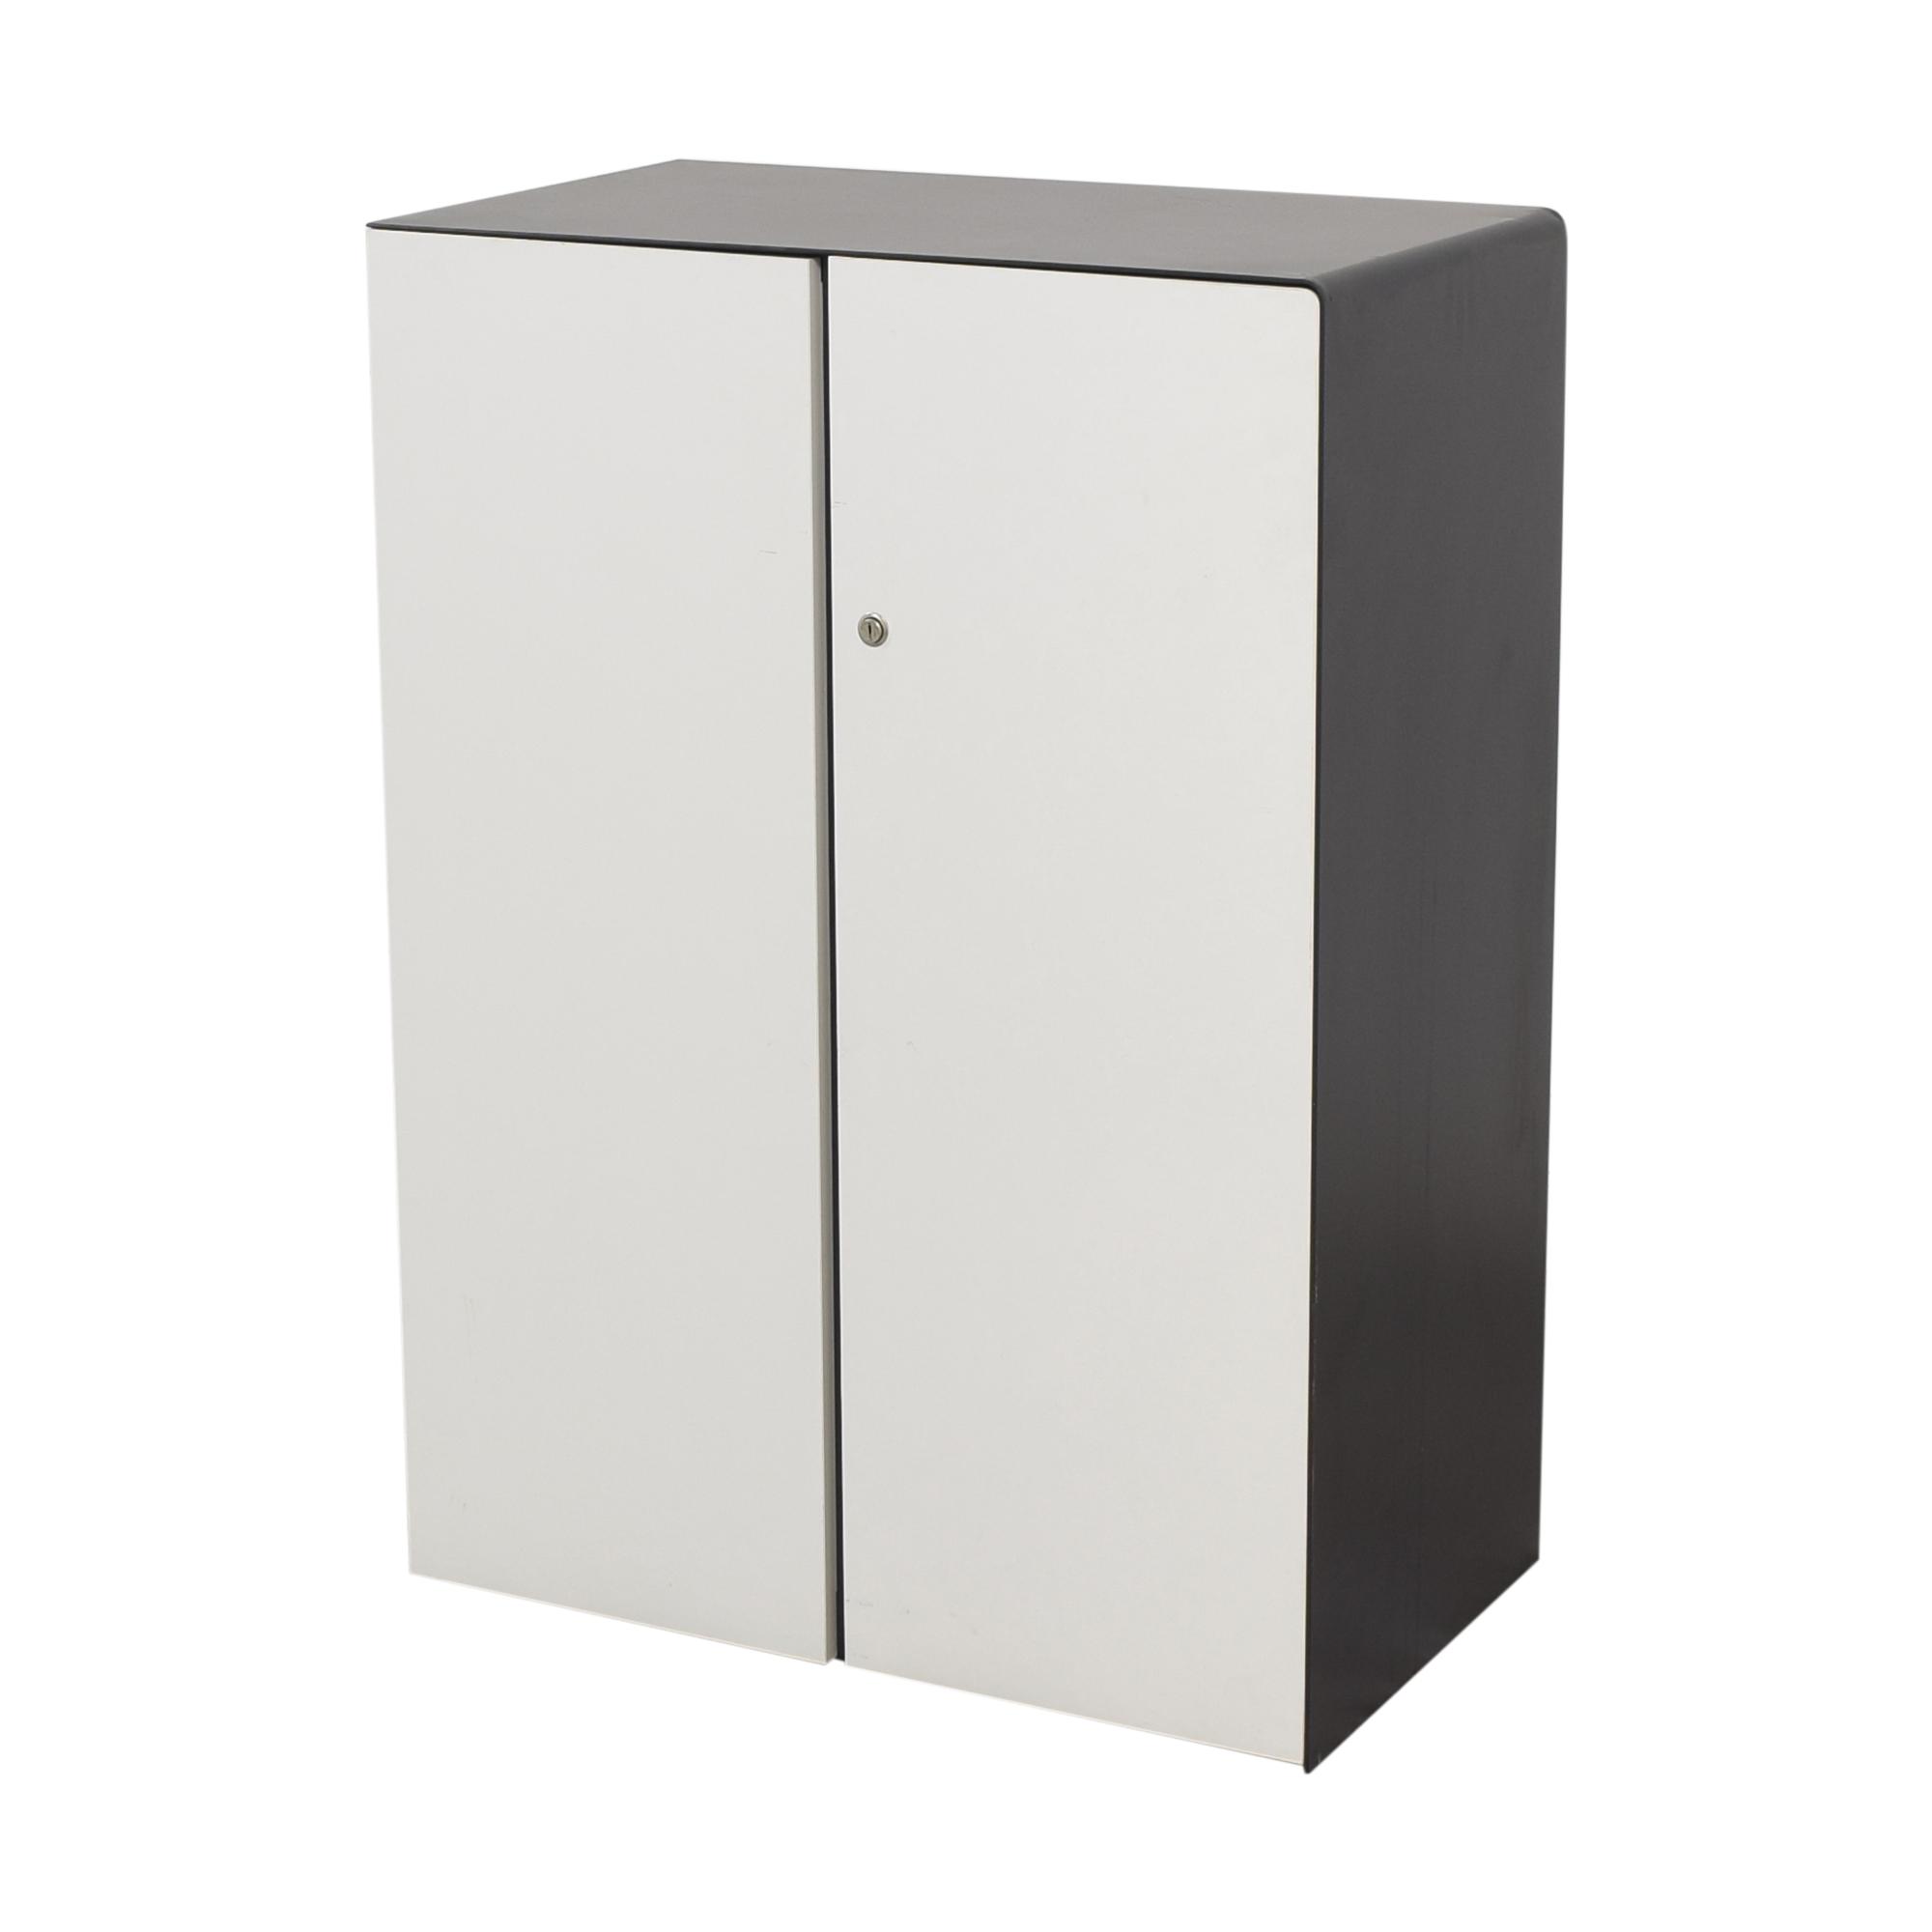 Koleksiyon Koleksiyon Song S2 Storage Cabinet nj